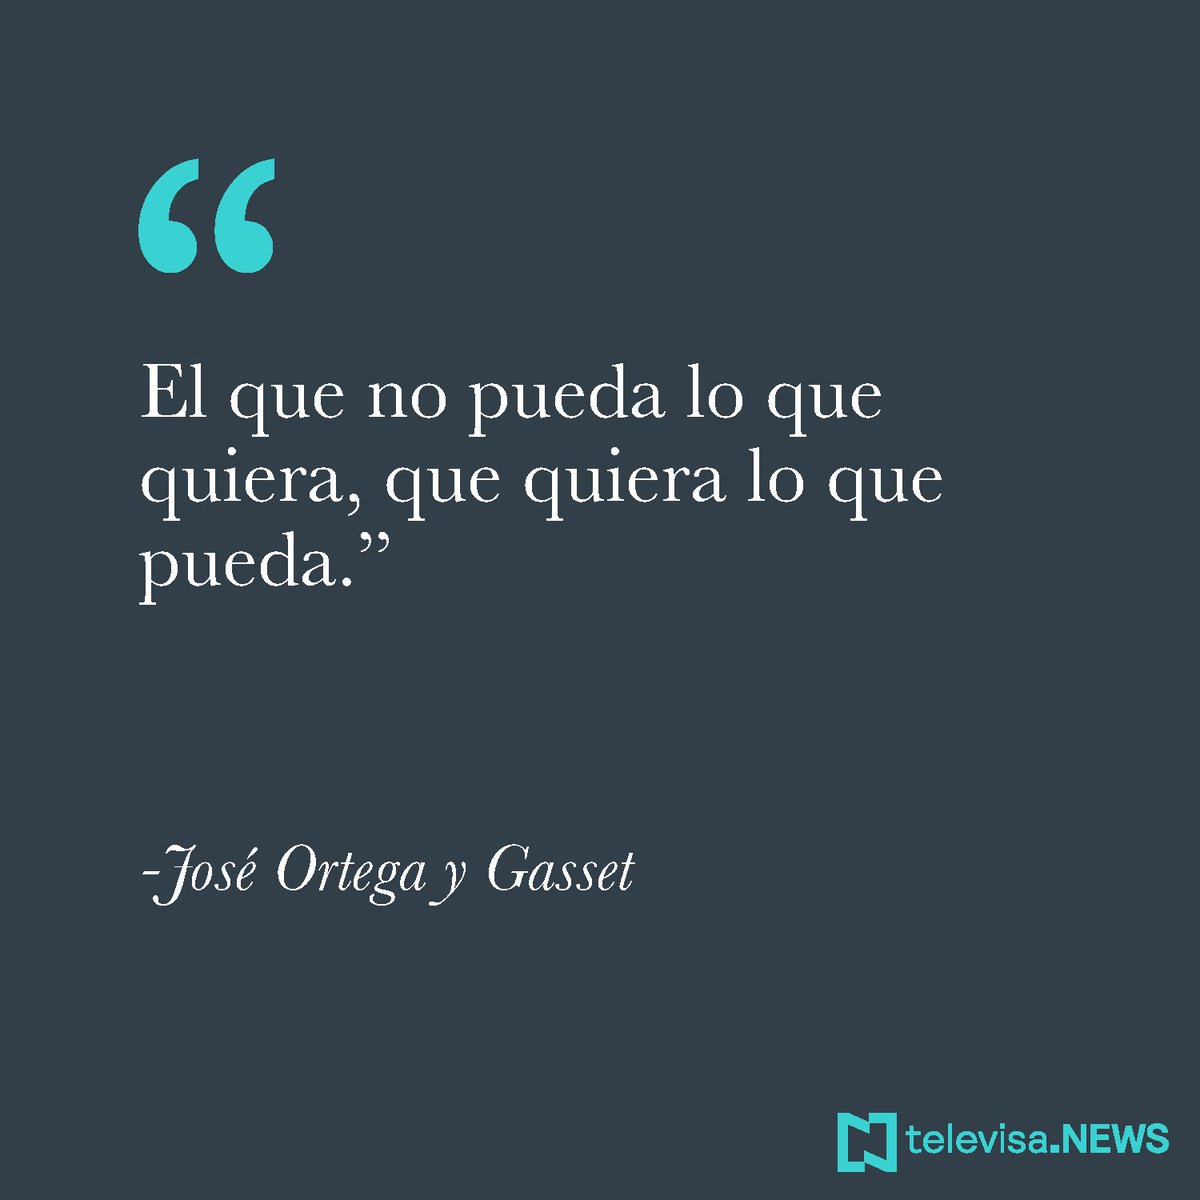 José Ortega Gasset Frase Recordamos José Ortega Gasset